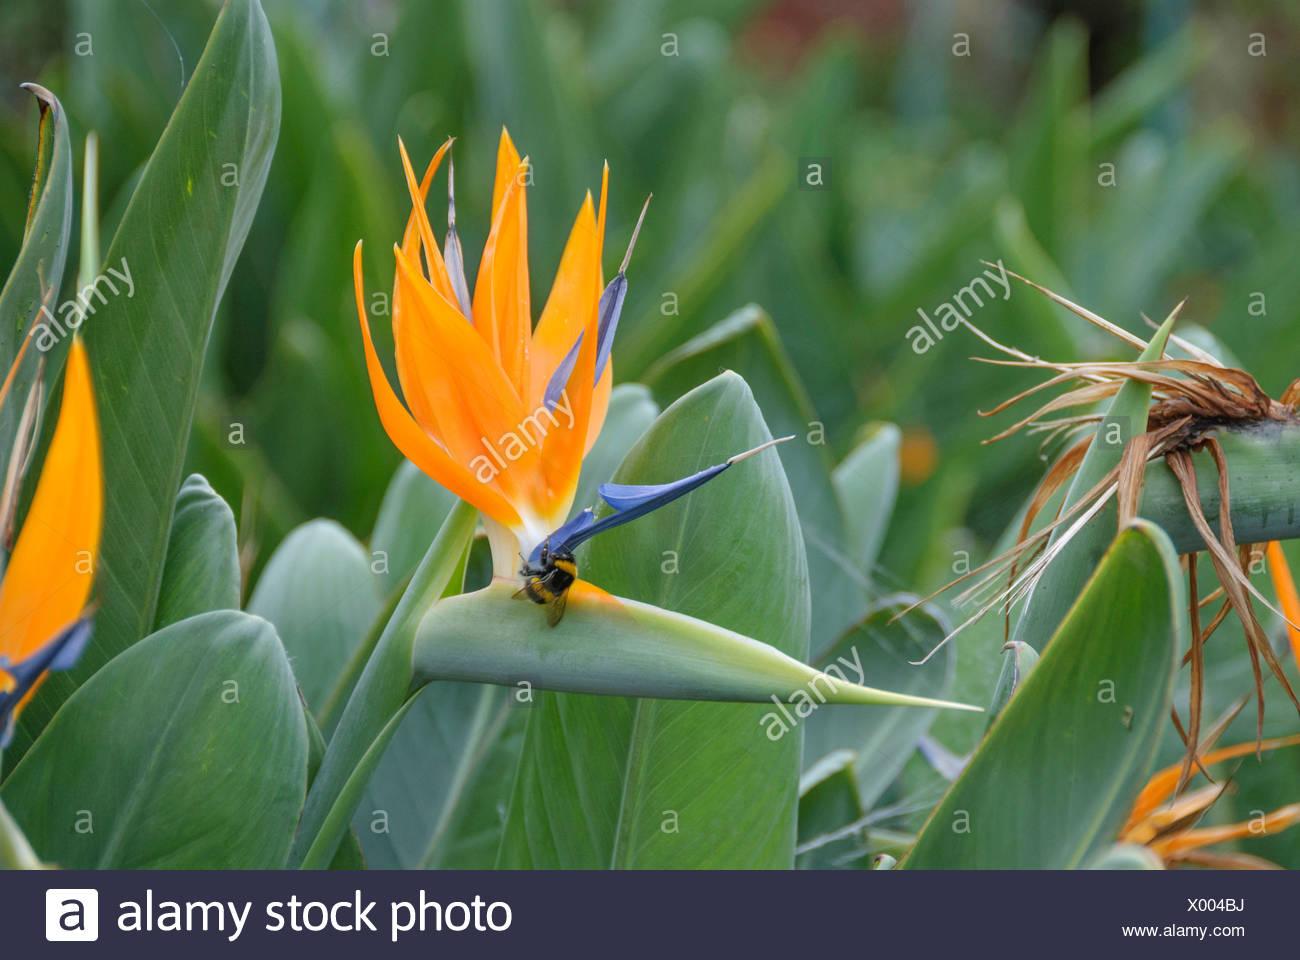 crane flower, bird of paradise flower, geel piesang (Strelitzia reginae), flower with humble bee - Stock Image